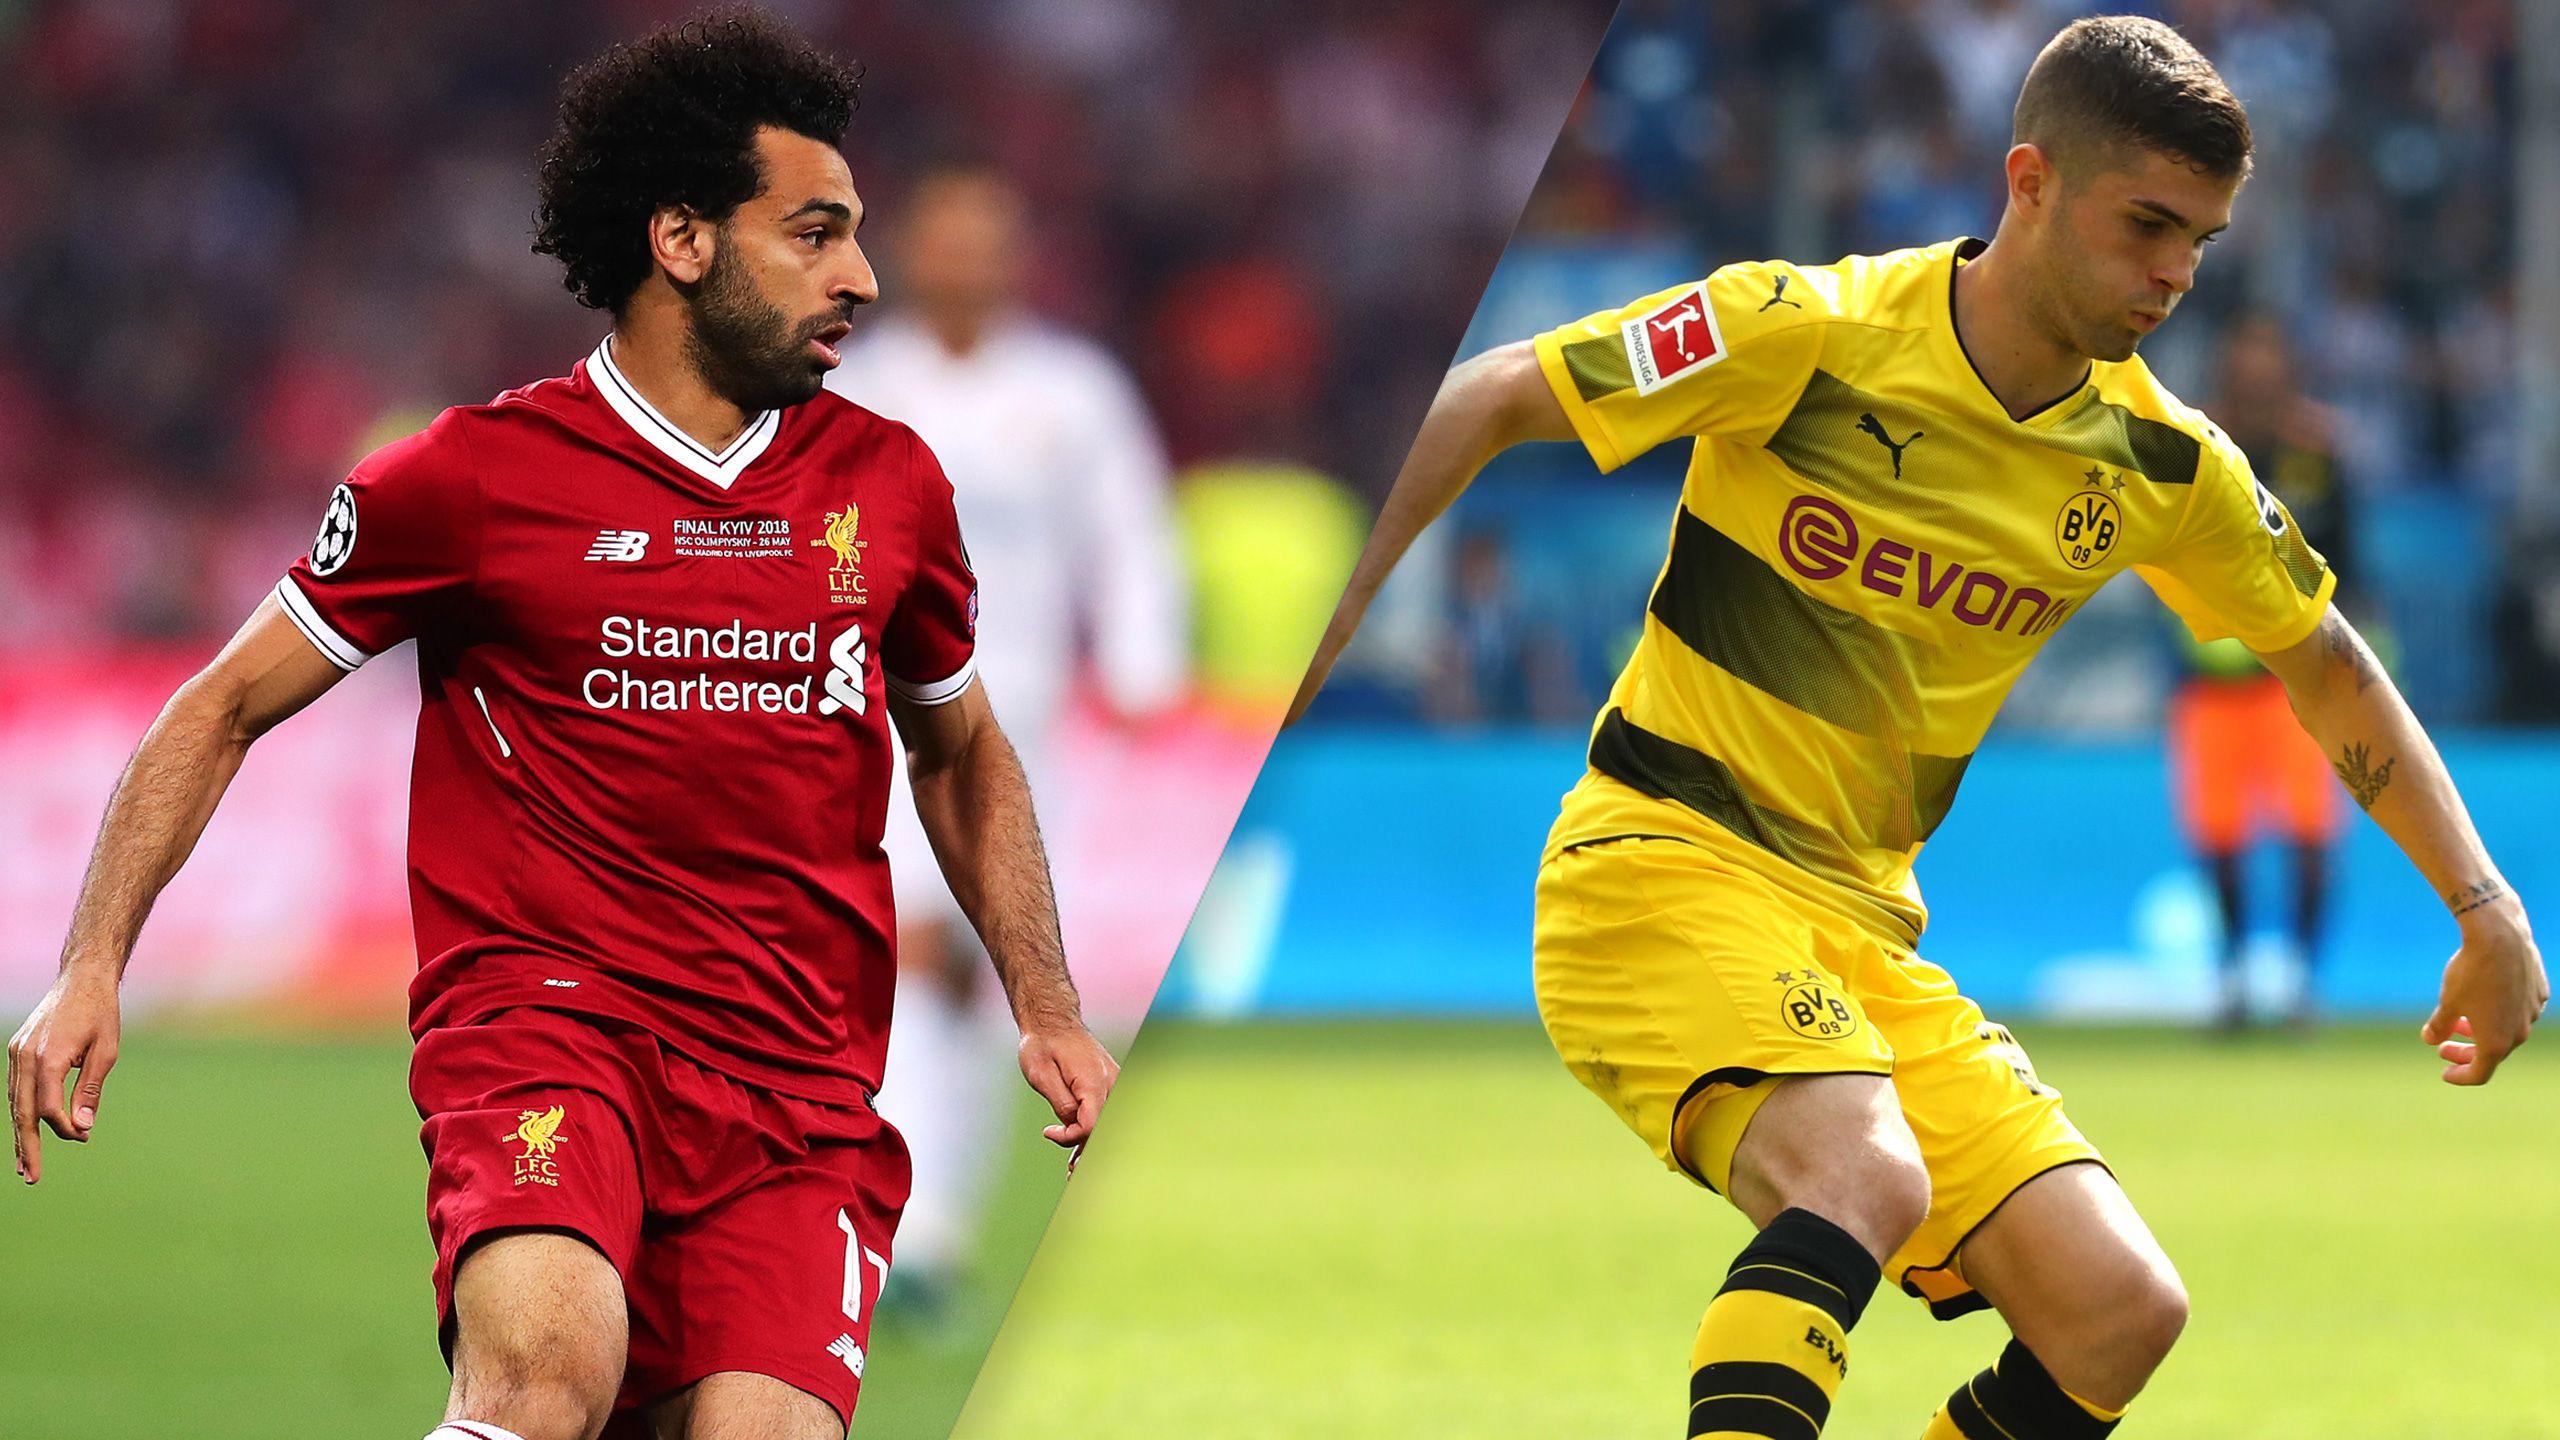 Liverpool vs. Borussia Dortmund (International Champions Cup)